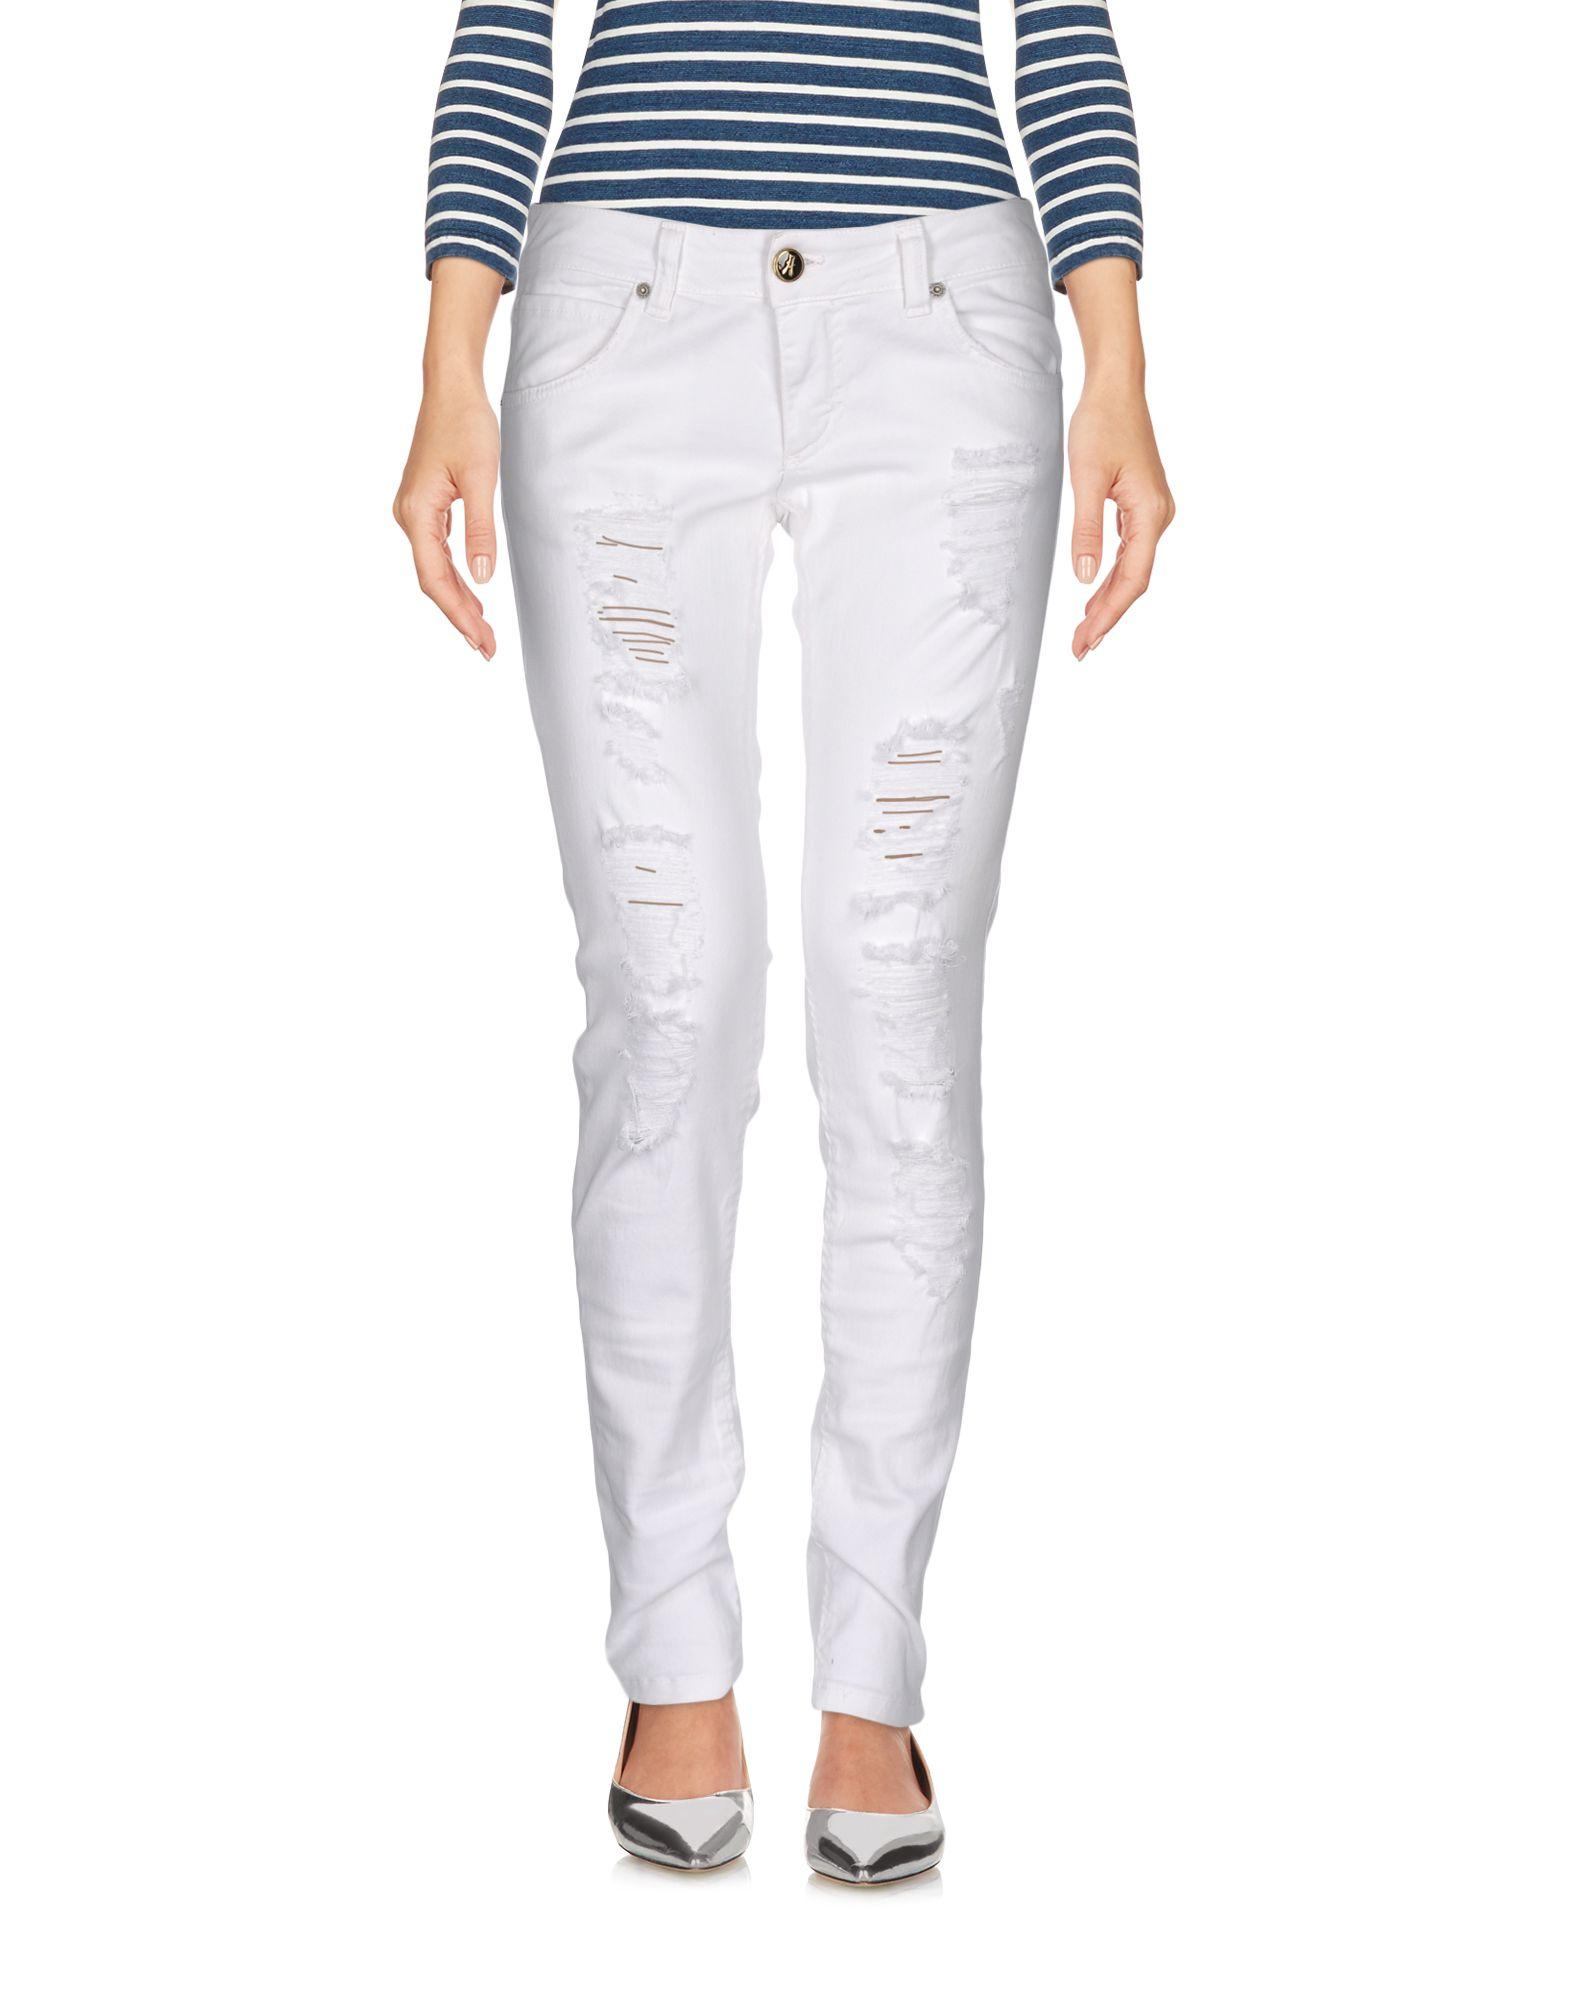 ANIYE BY Damen Jeanshose Farbe Weiß Größe 6